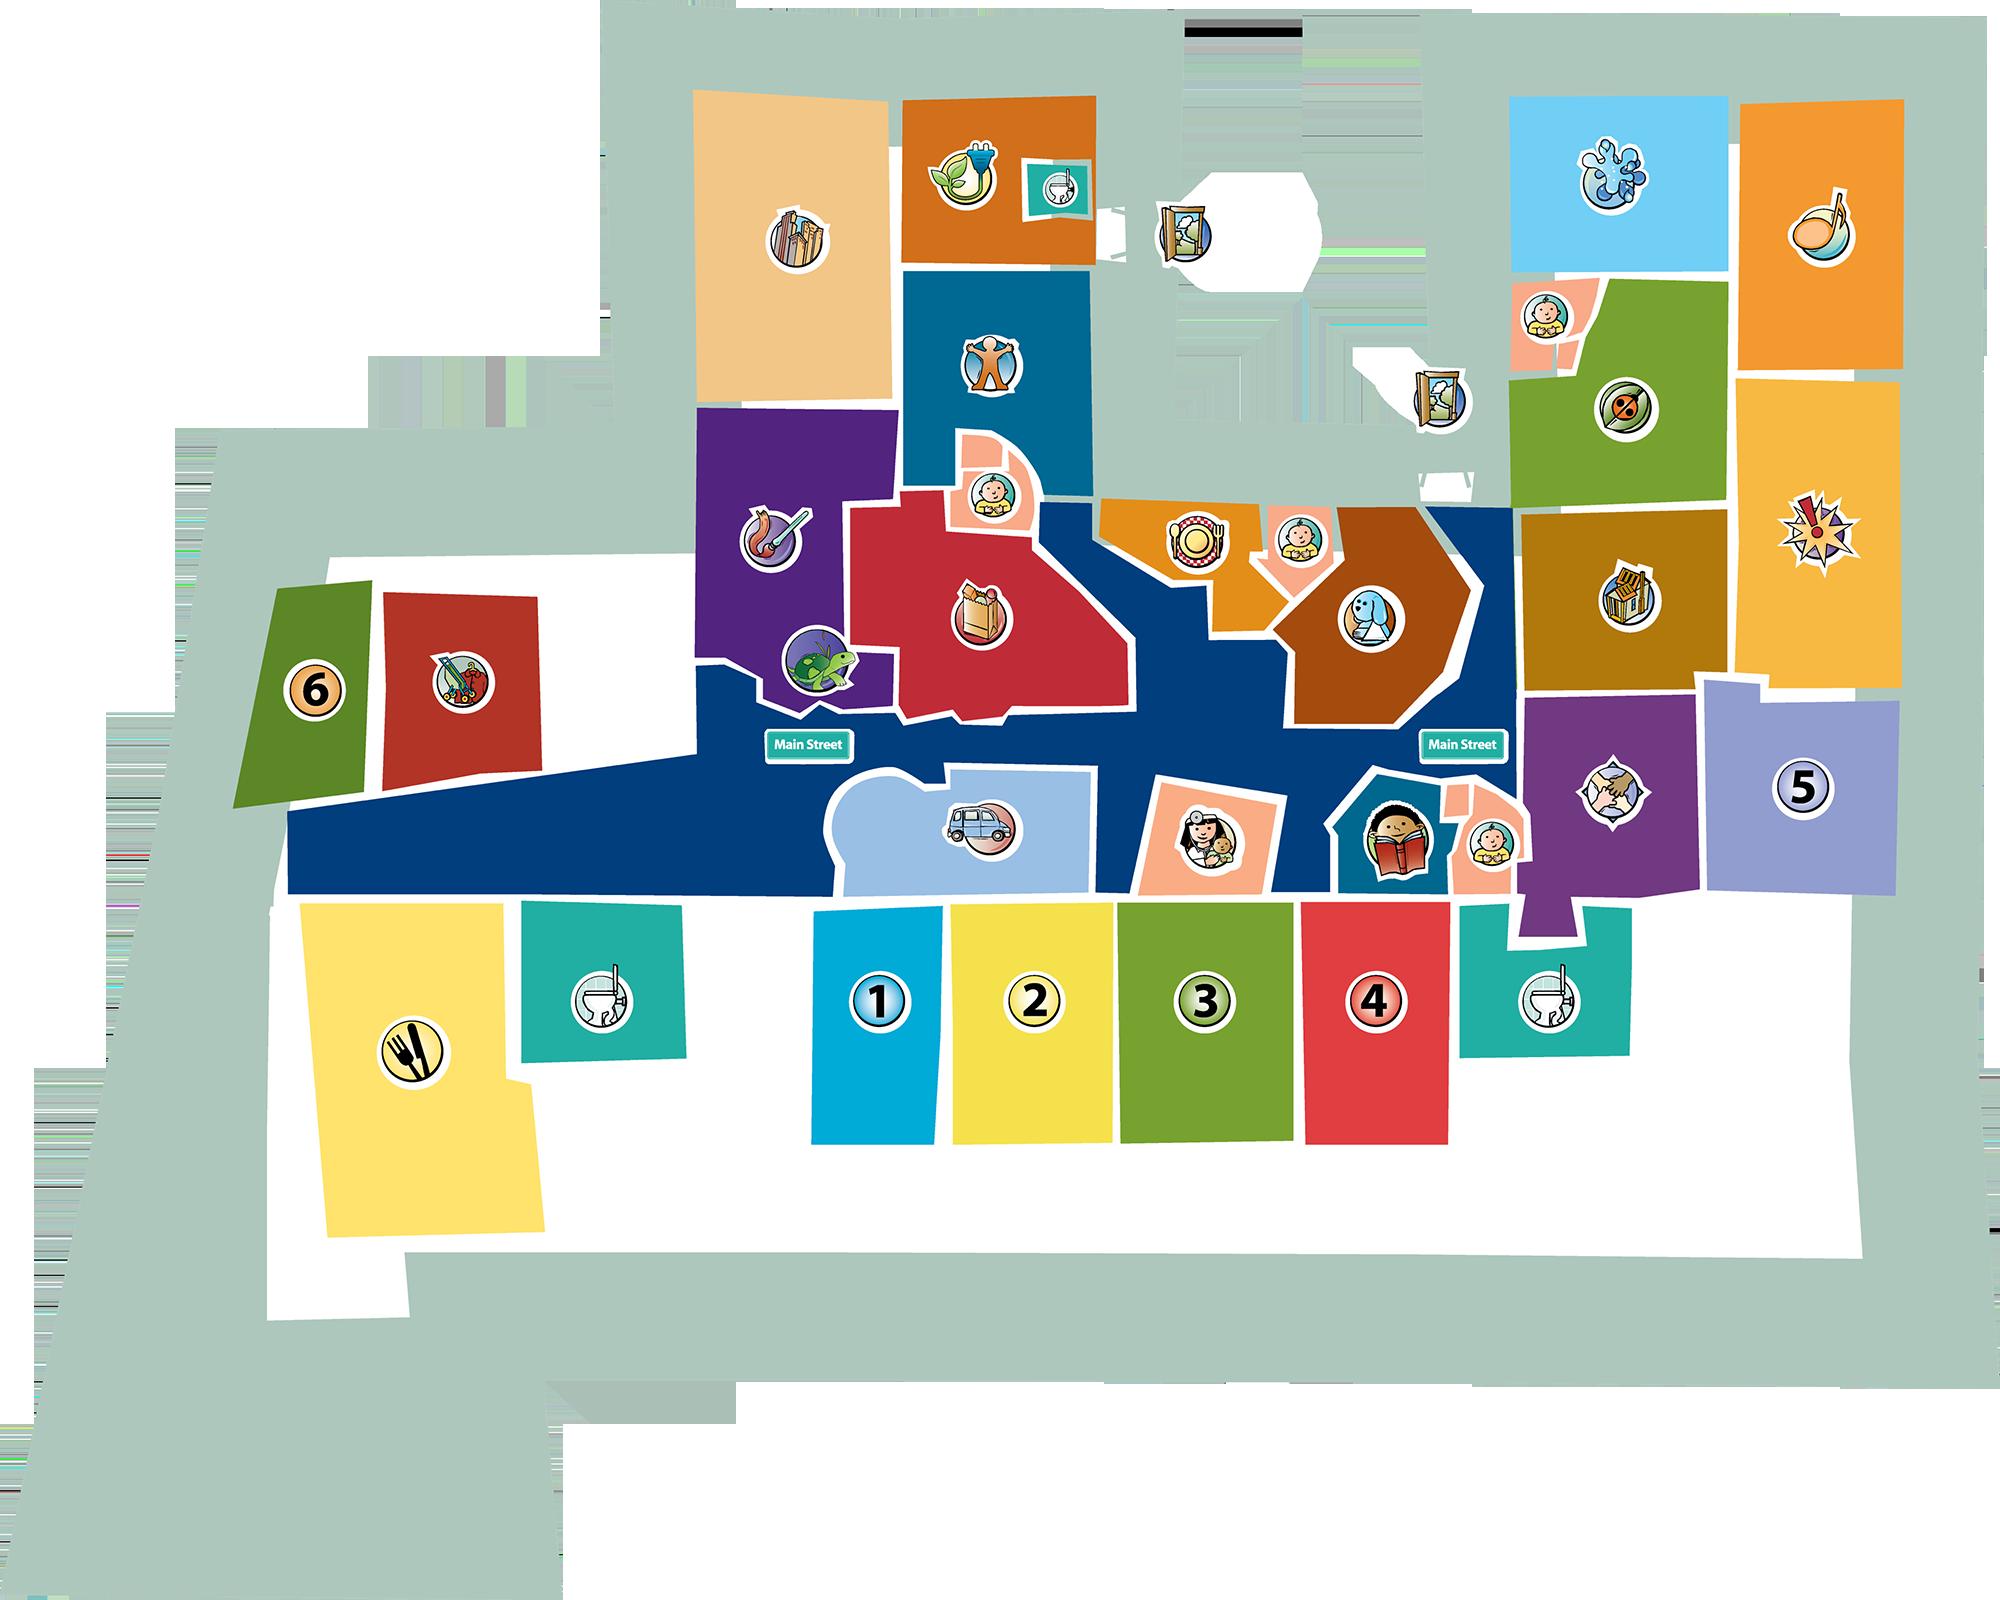 Museum Map - Kohl Children's Museum on camp randall stadium map, target map, nordstrom map, dollar general map, lands end map, menards map, old navy map, petsmart map, gamestop map, petco map, guitar center map, puma map, dillard's map,